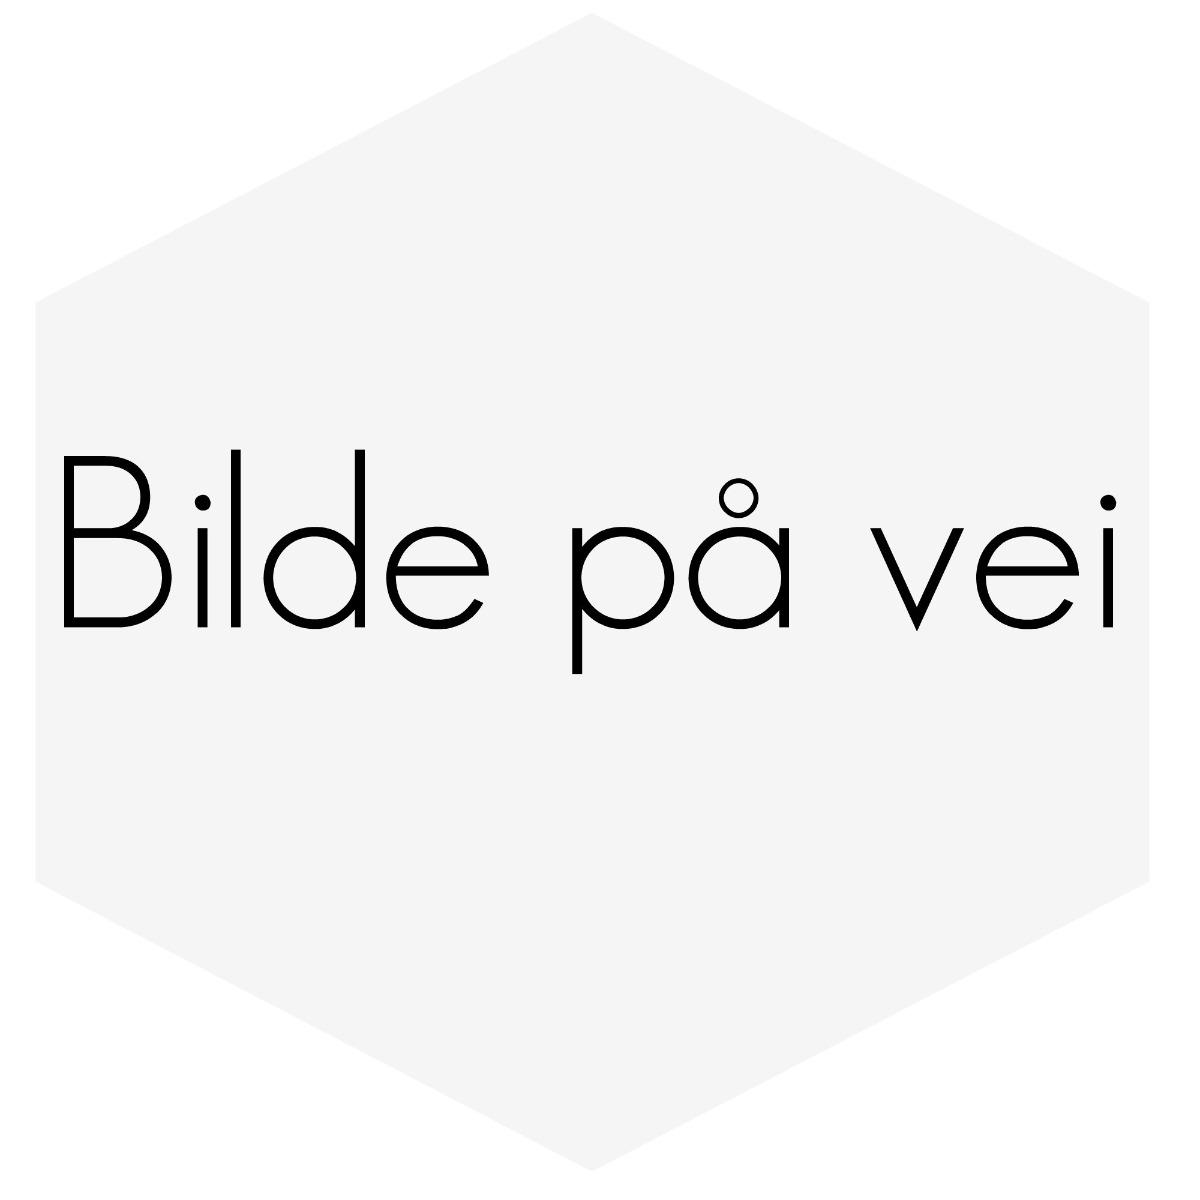 SKVETTLAPP FESTE PLATE VOLVO 140/164/200 stk pris